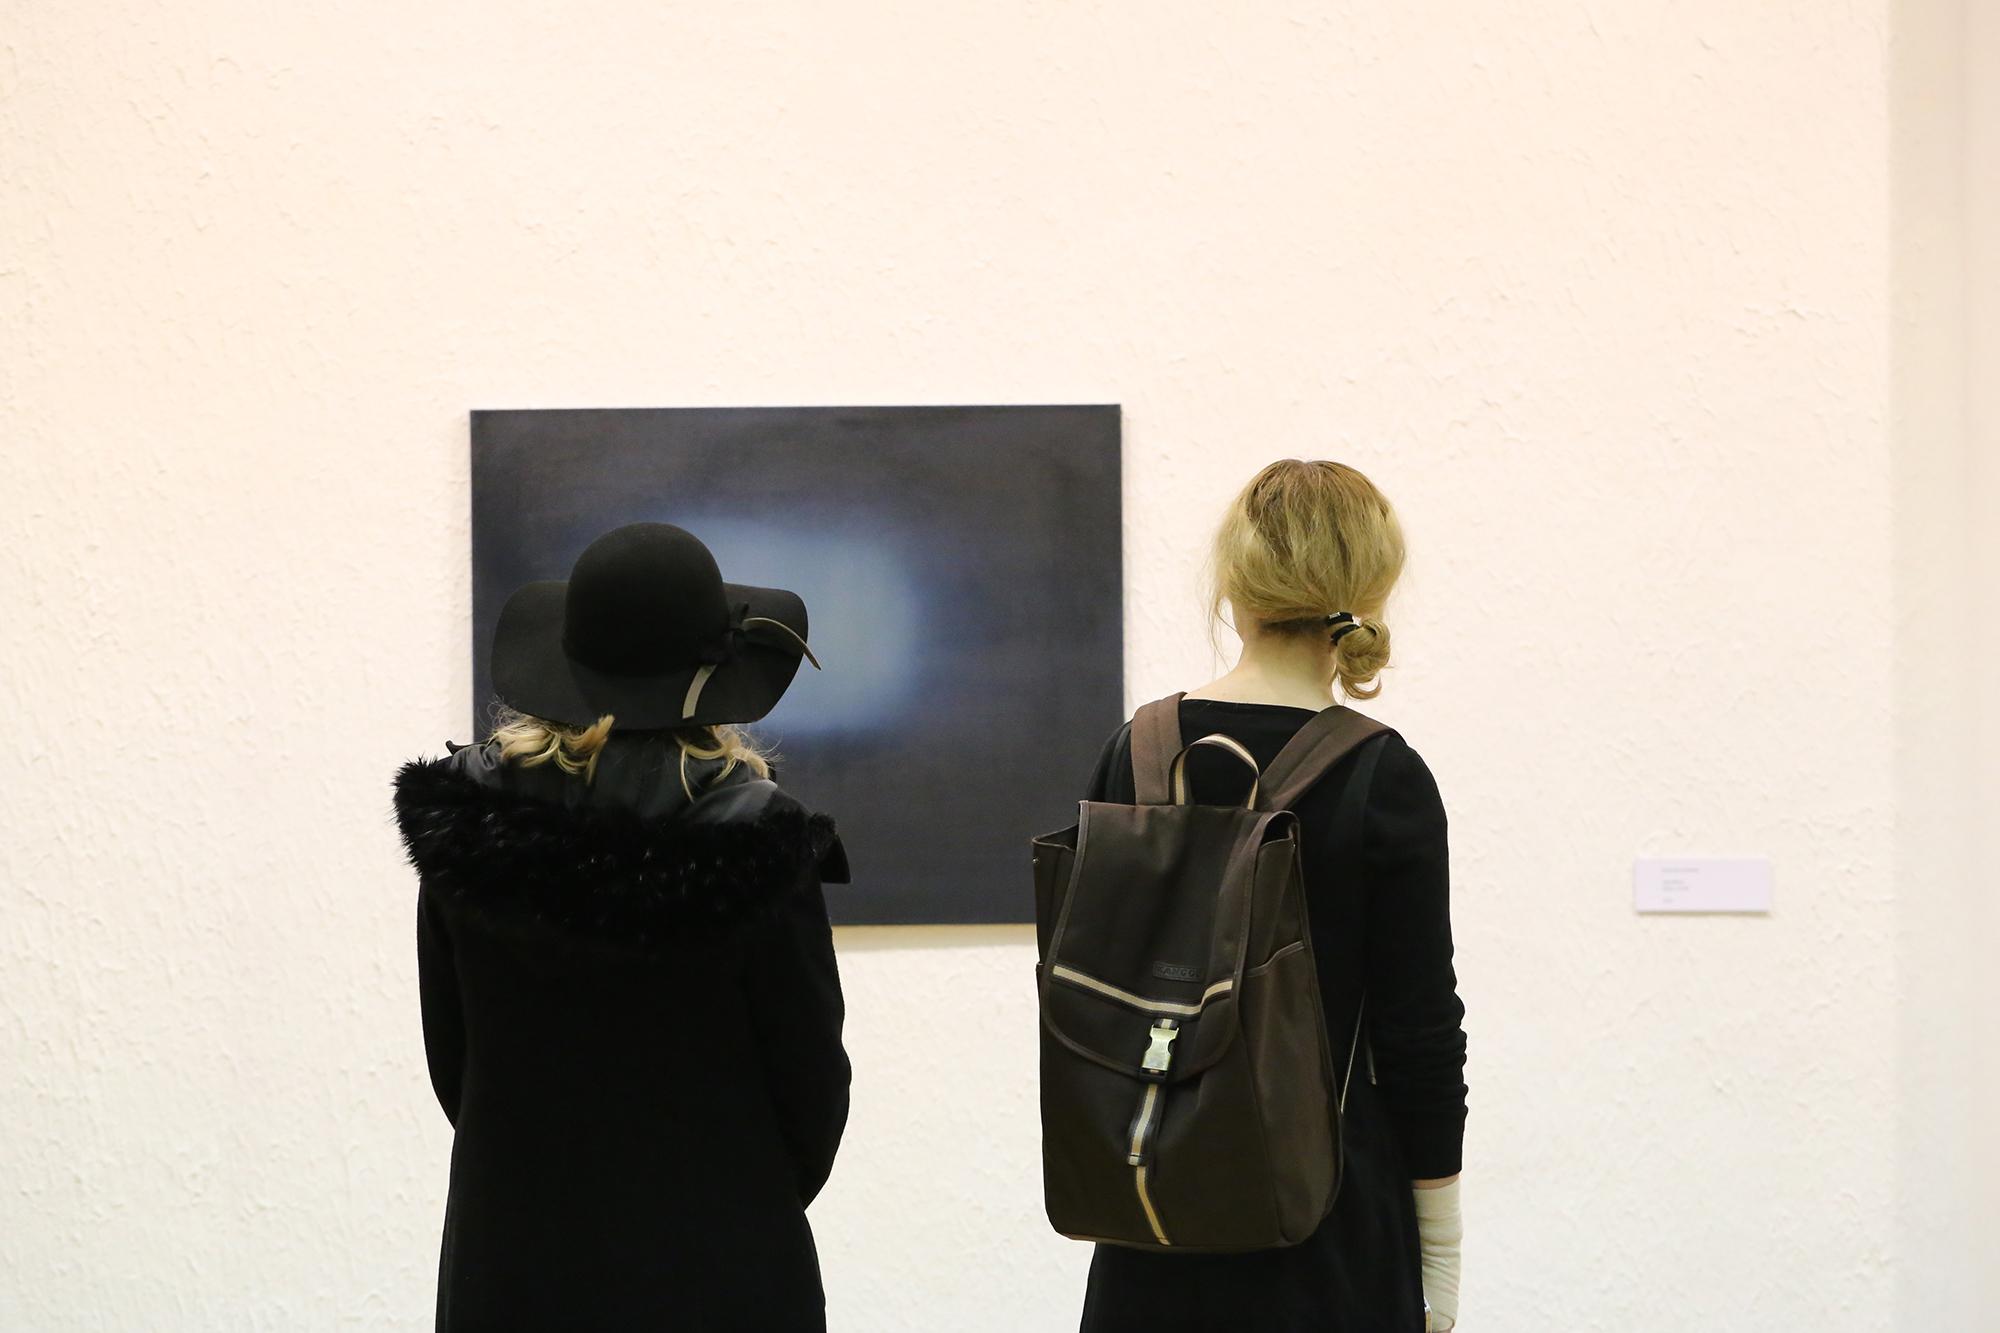 Exhibition view of  Overlapped , by Rosanda Sorakaitė